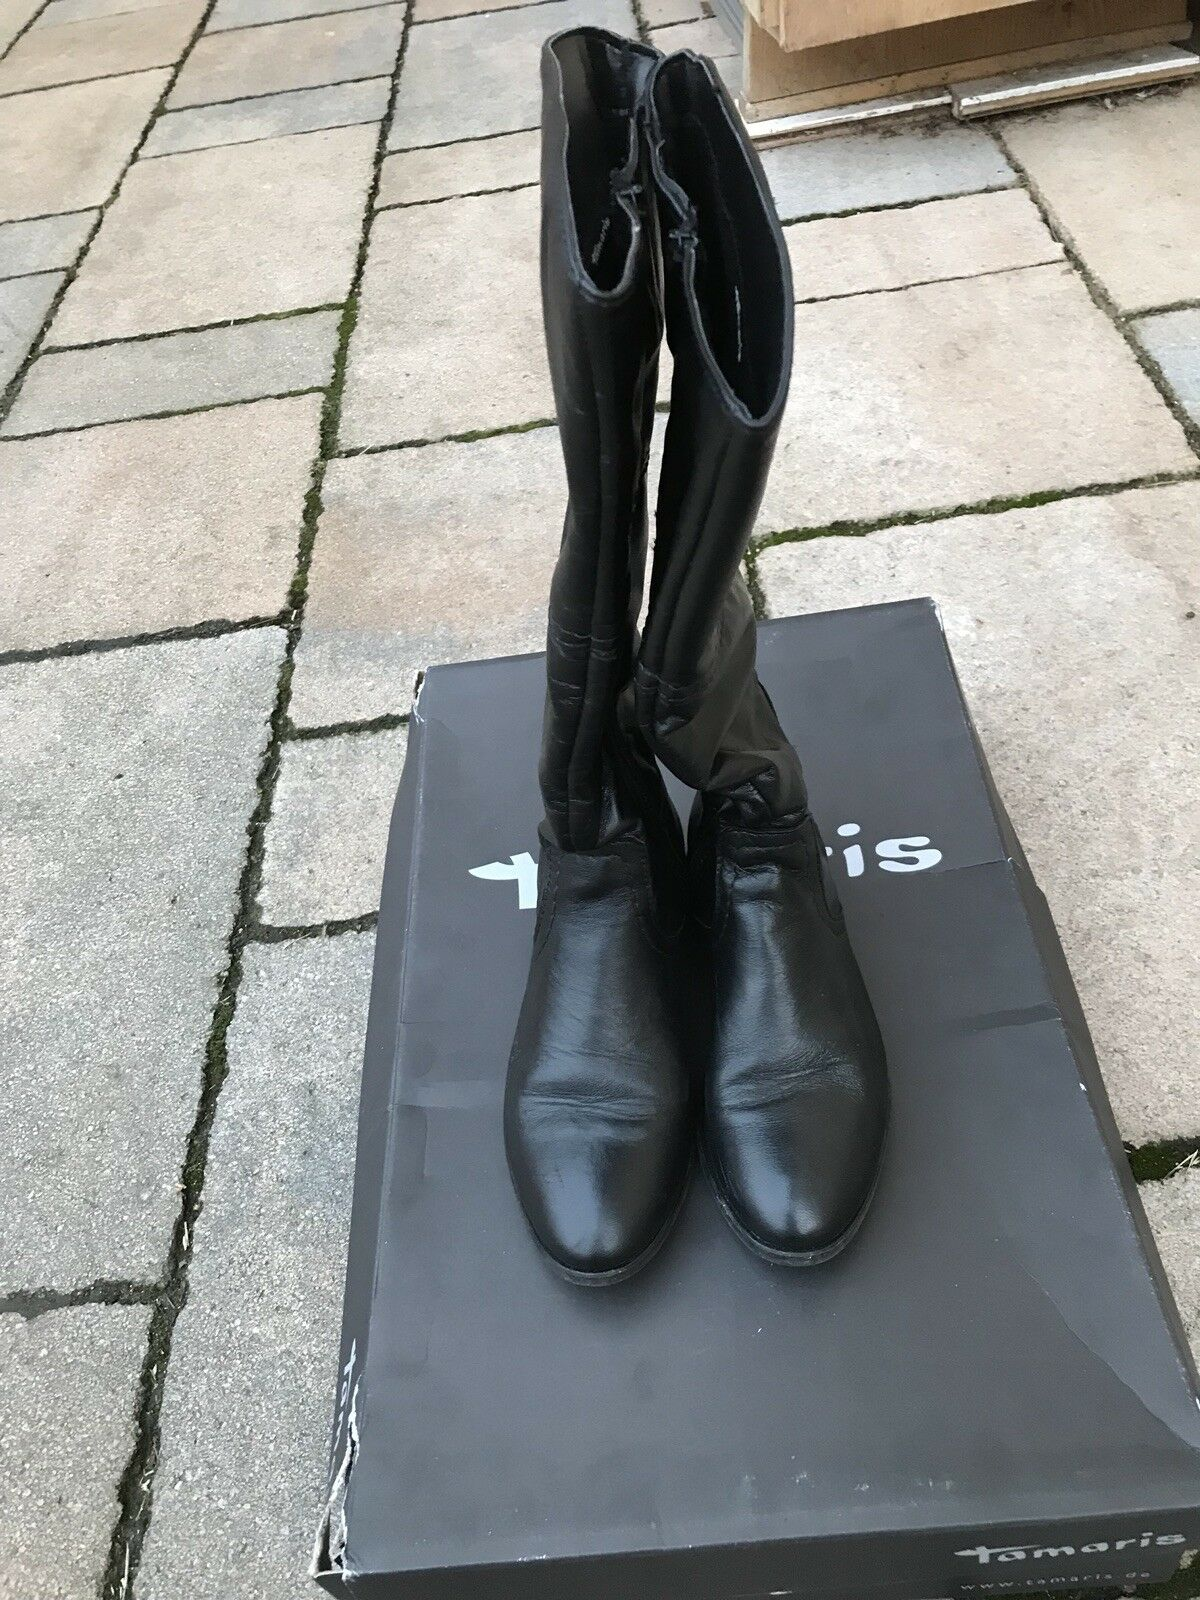 Tamaris Tamaris Tamaris Lederstiefel Damen Winterschuhe Damen Leder Größe 37 Winter Stiefel 820f66